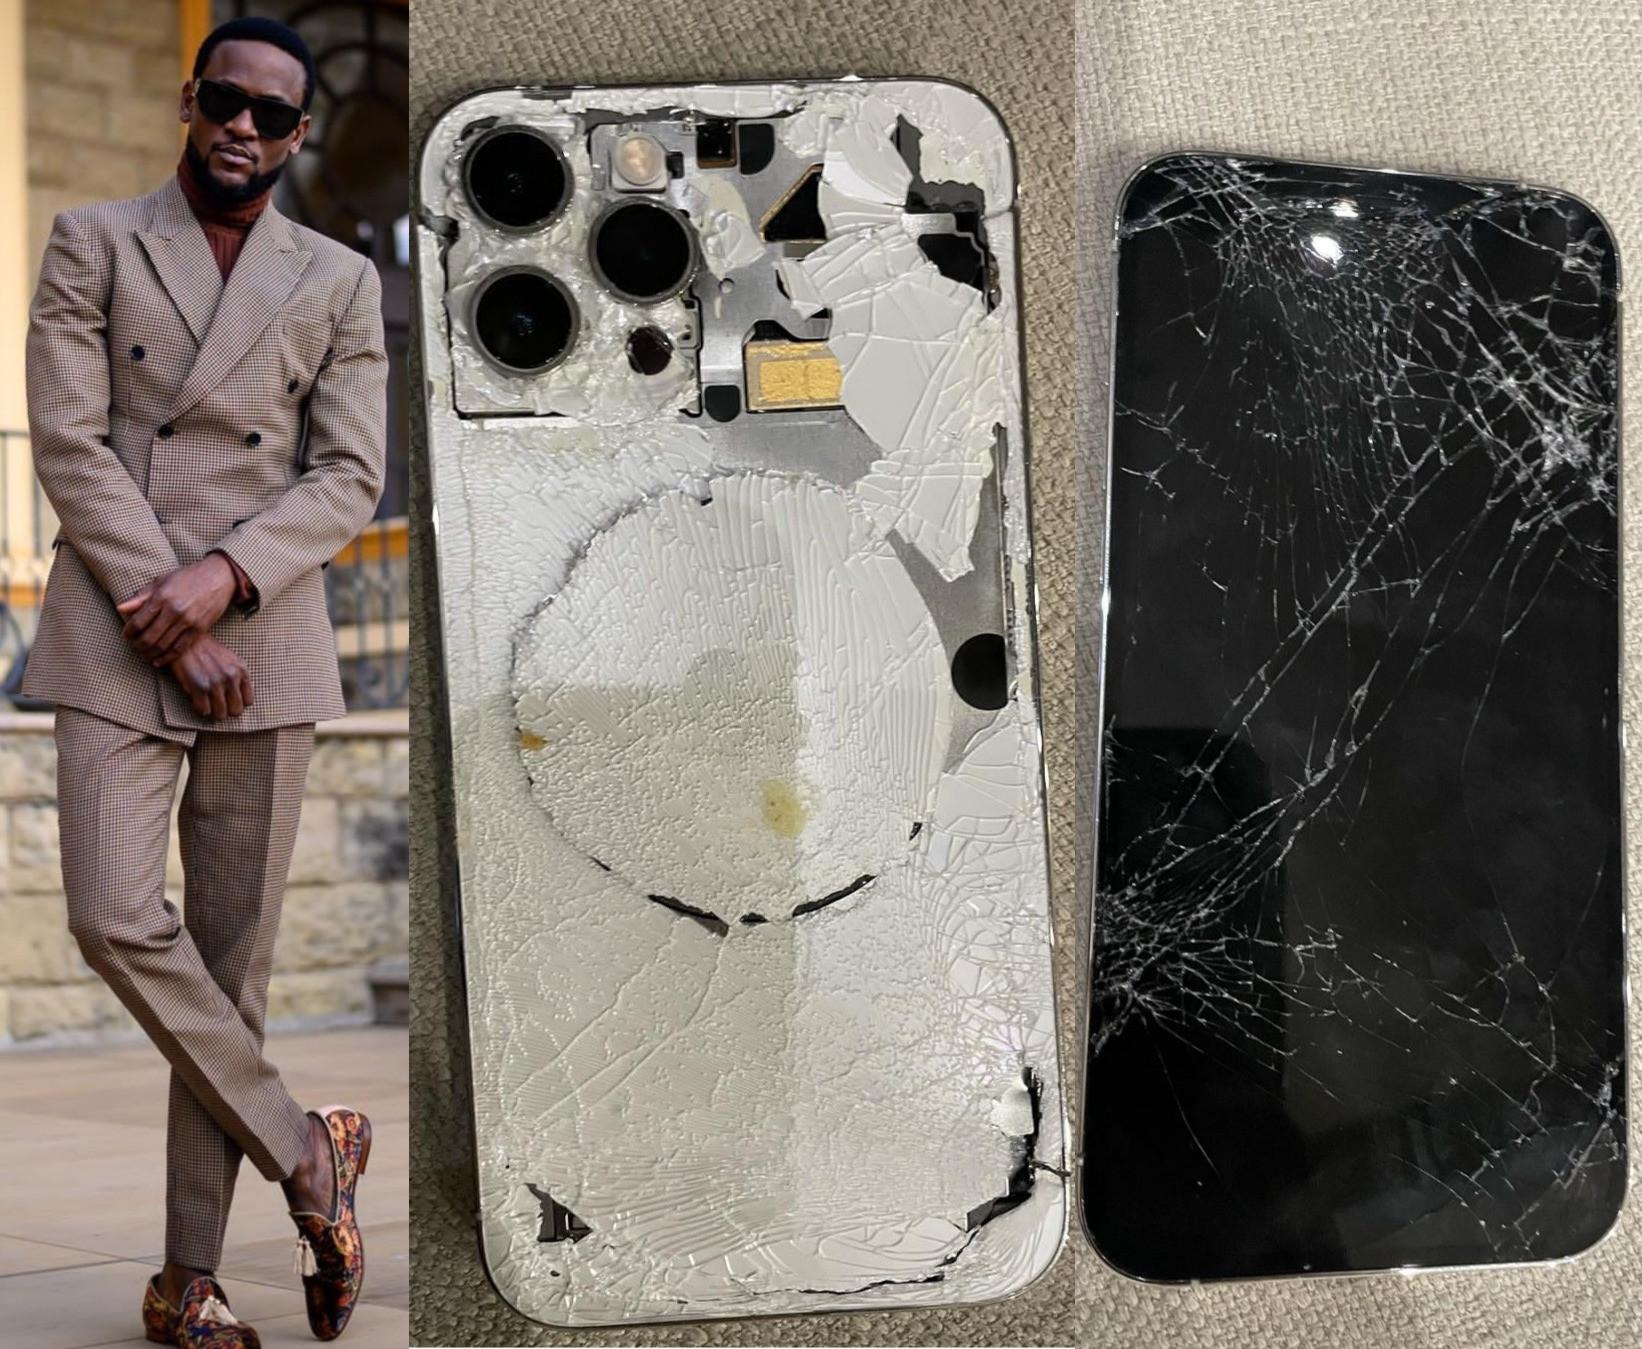 BBNaija star, Omashola recounts how he saved himself during robbery incident by gun-wielding men